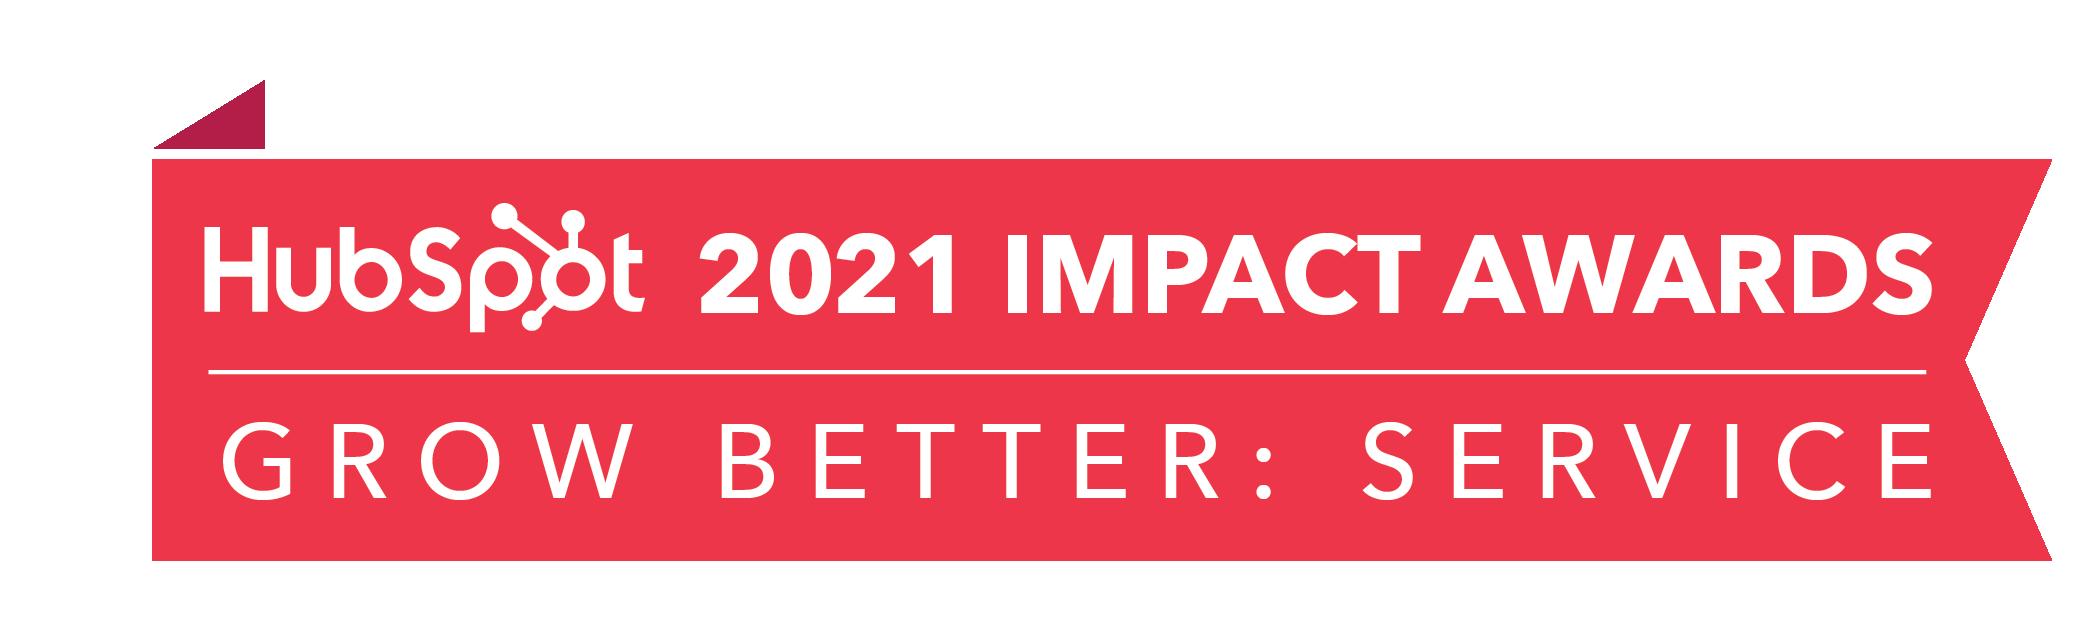 HubSpot_ImpactAwards_2021_GBService2-1